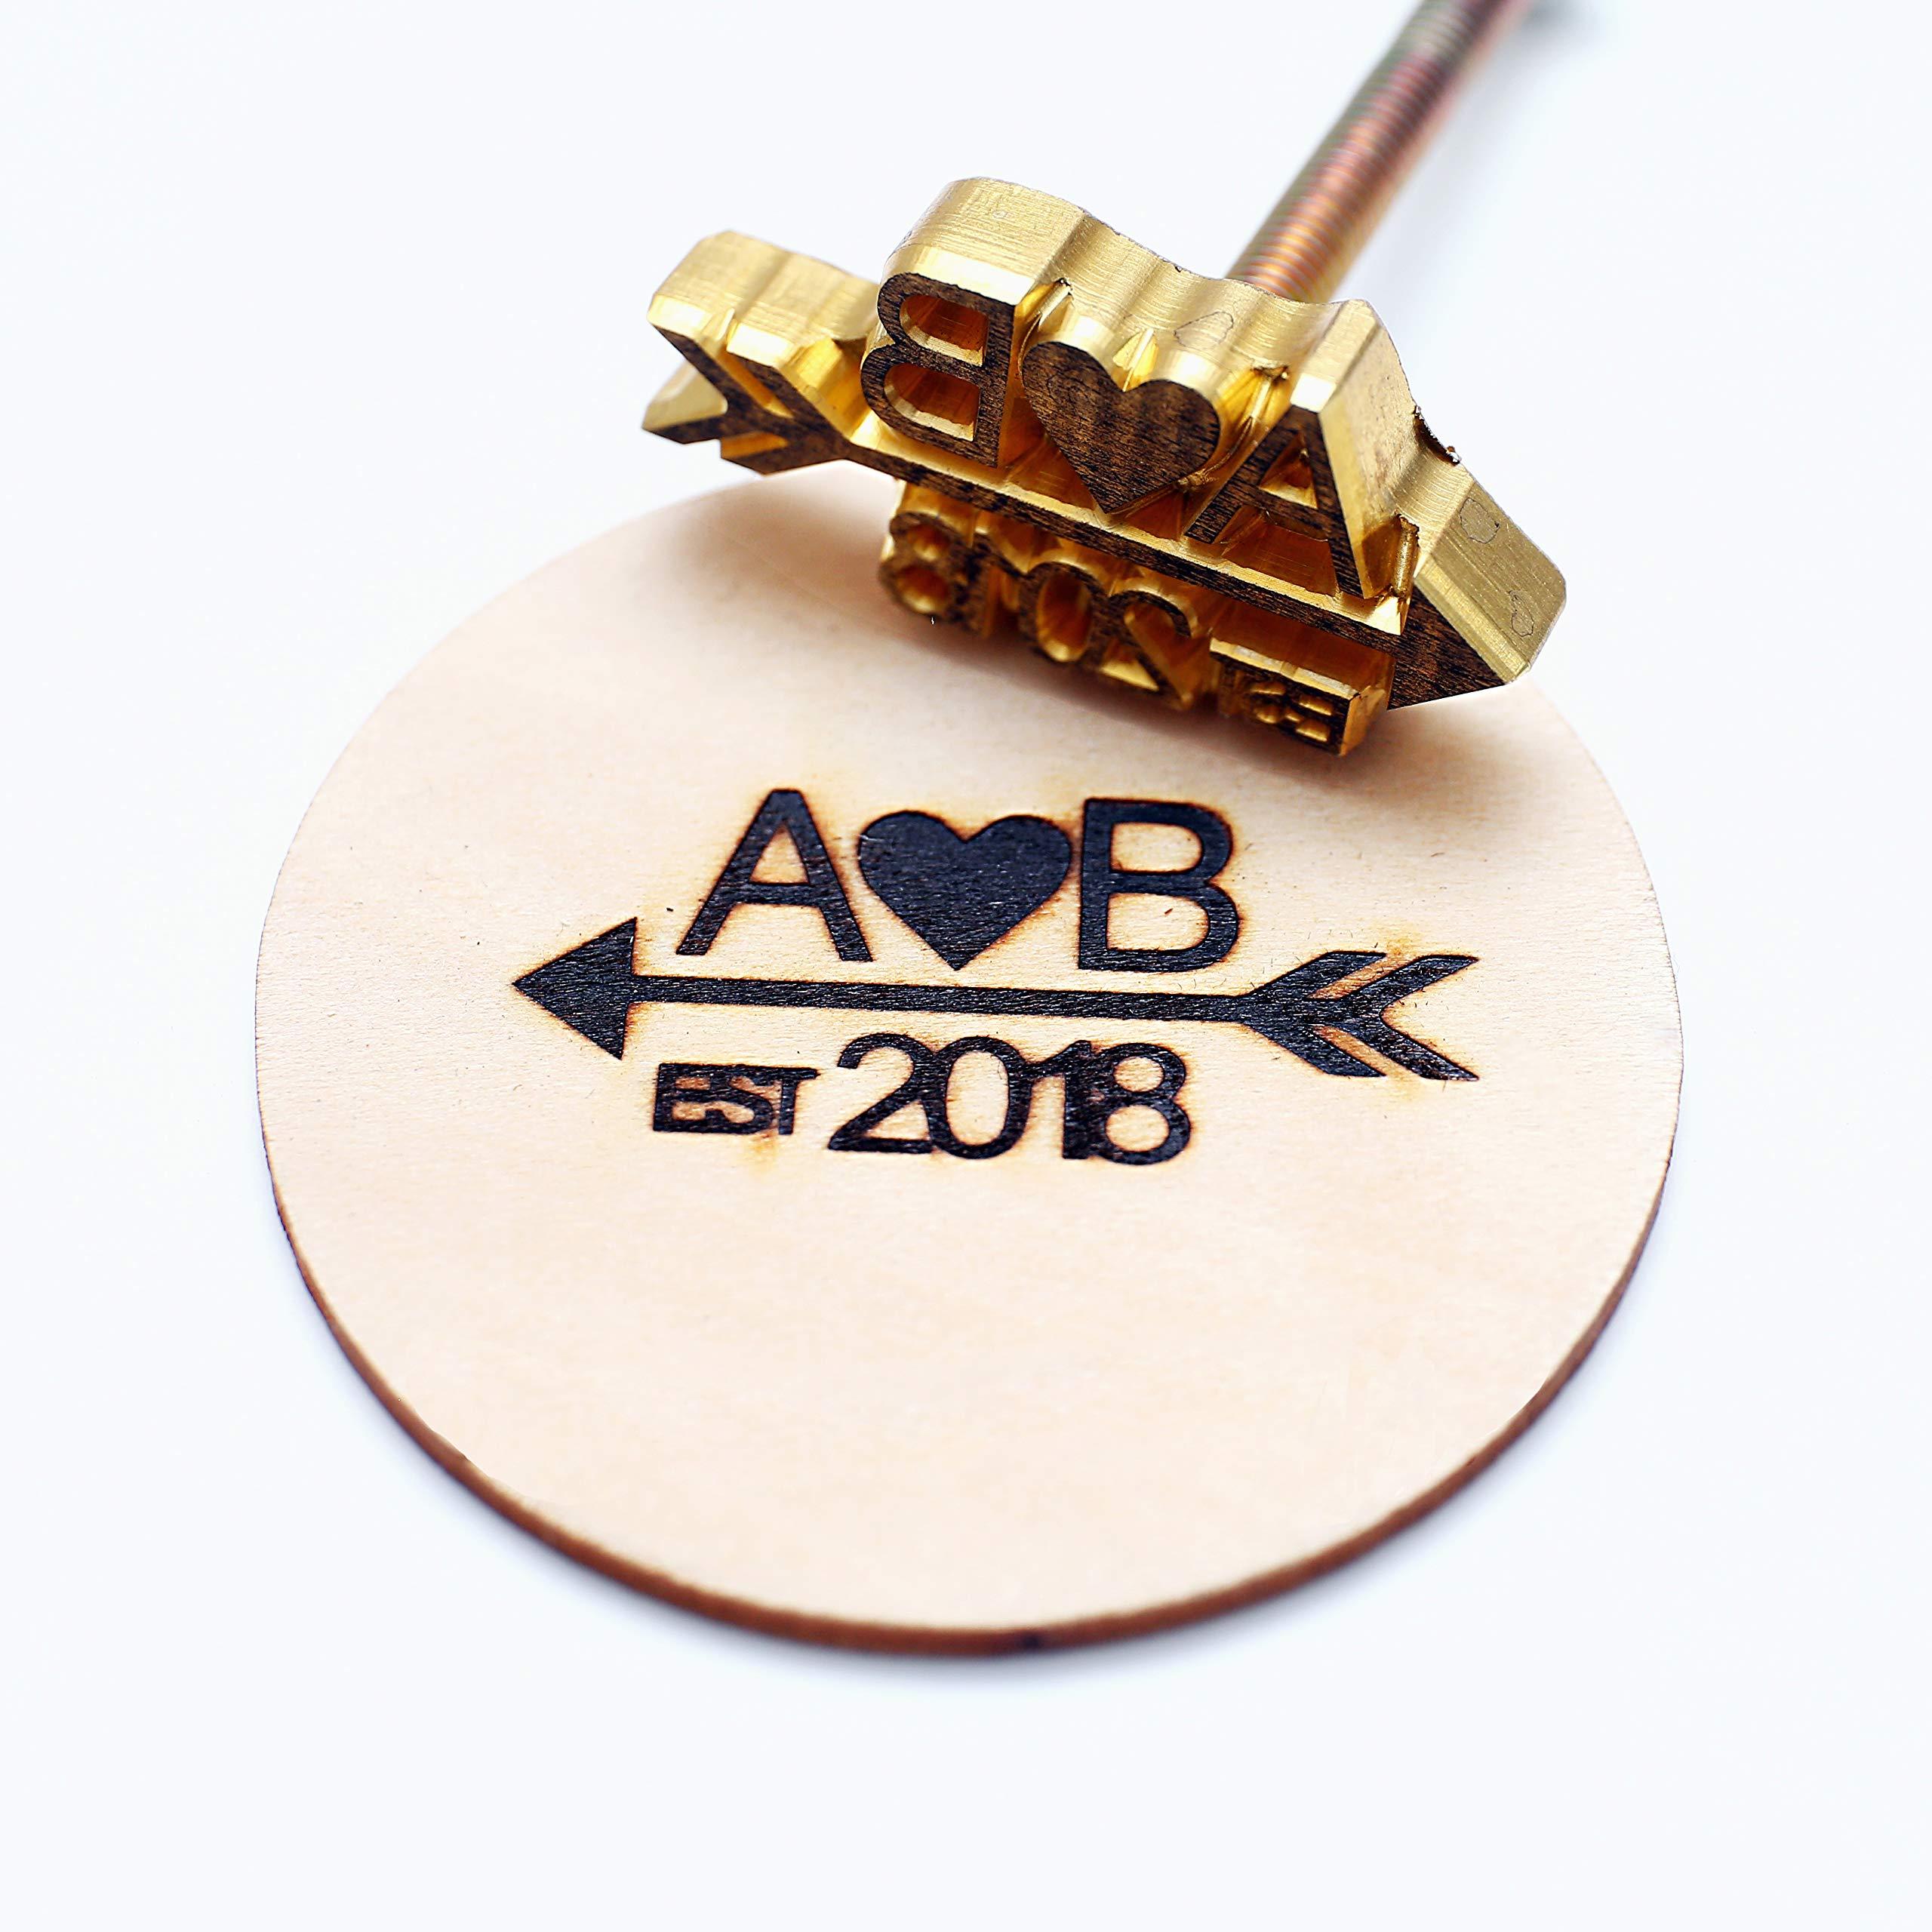 Custom Logo Wood Branding Iron,Durable Leather Branding Iron Stamp,Wood Branding Iron/Wedding Gift,Initials with Arrow Design (2''x2'')